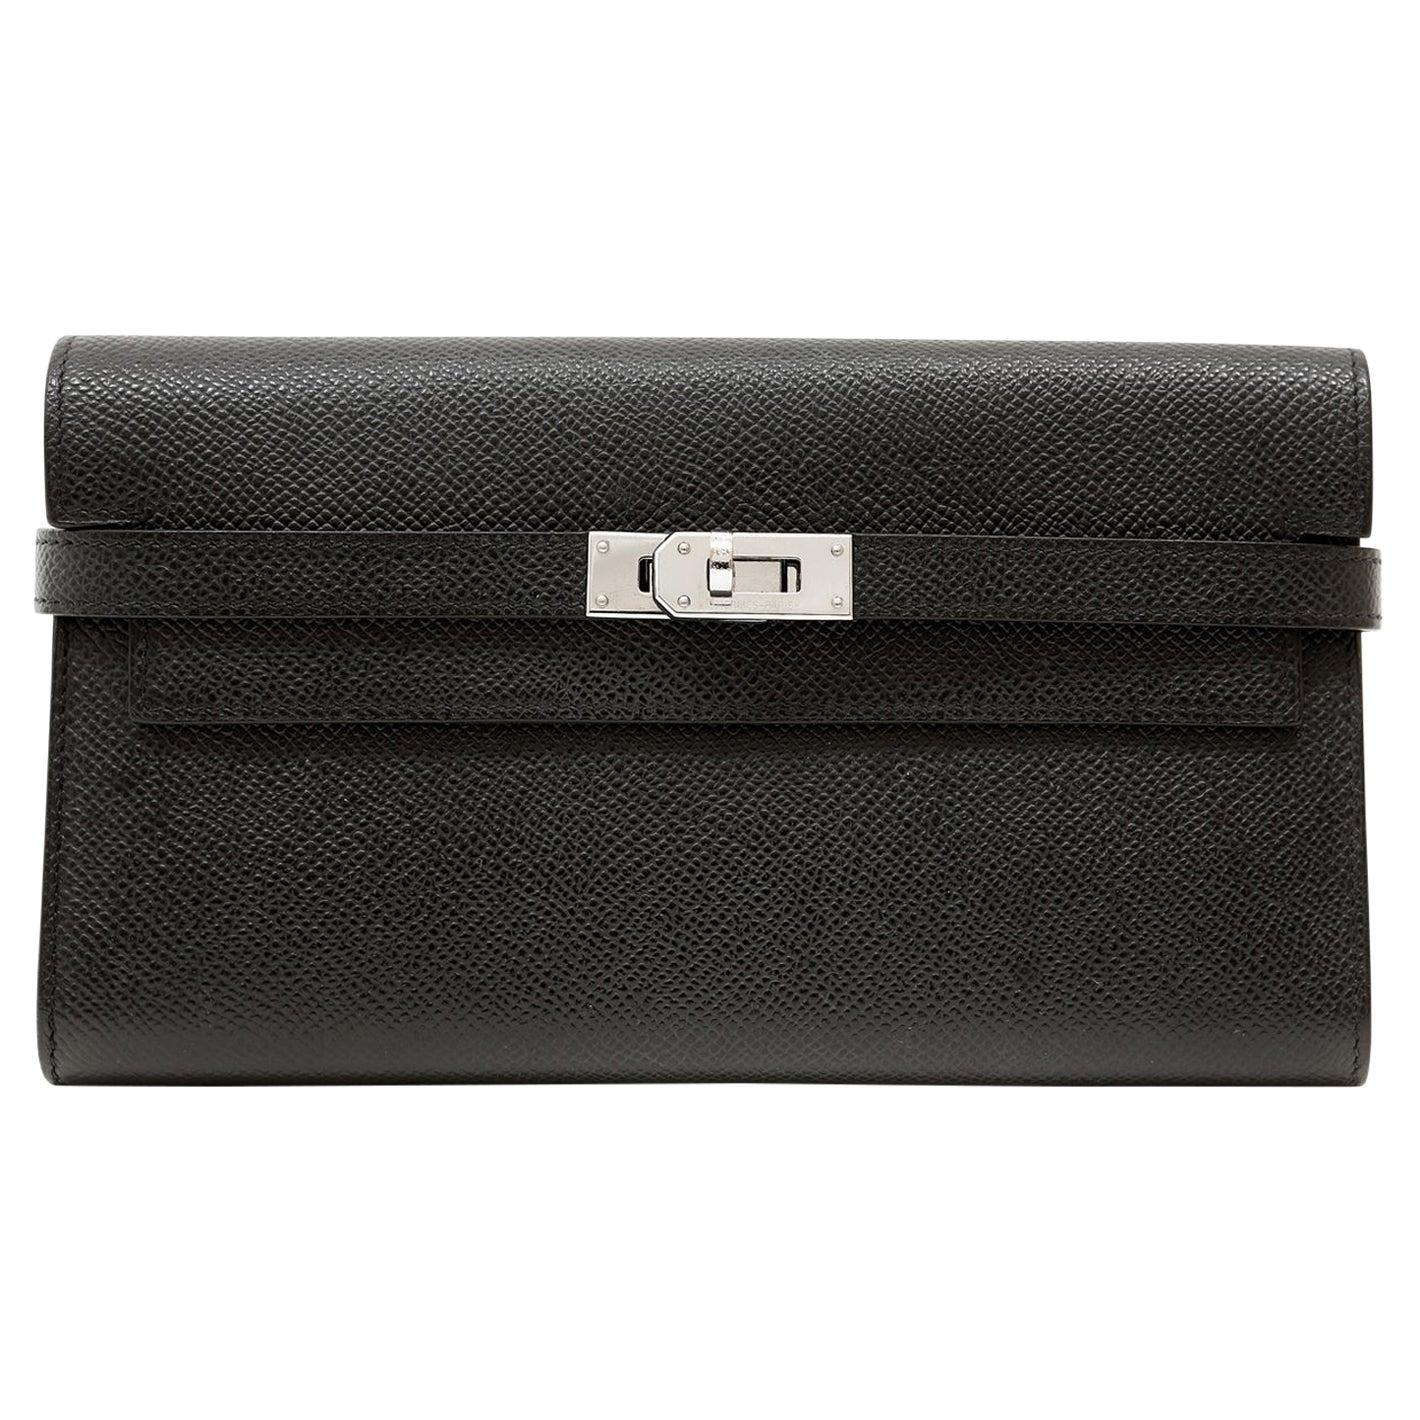 Hermès Black Epsom Kelly Wallet